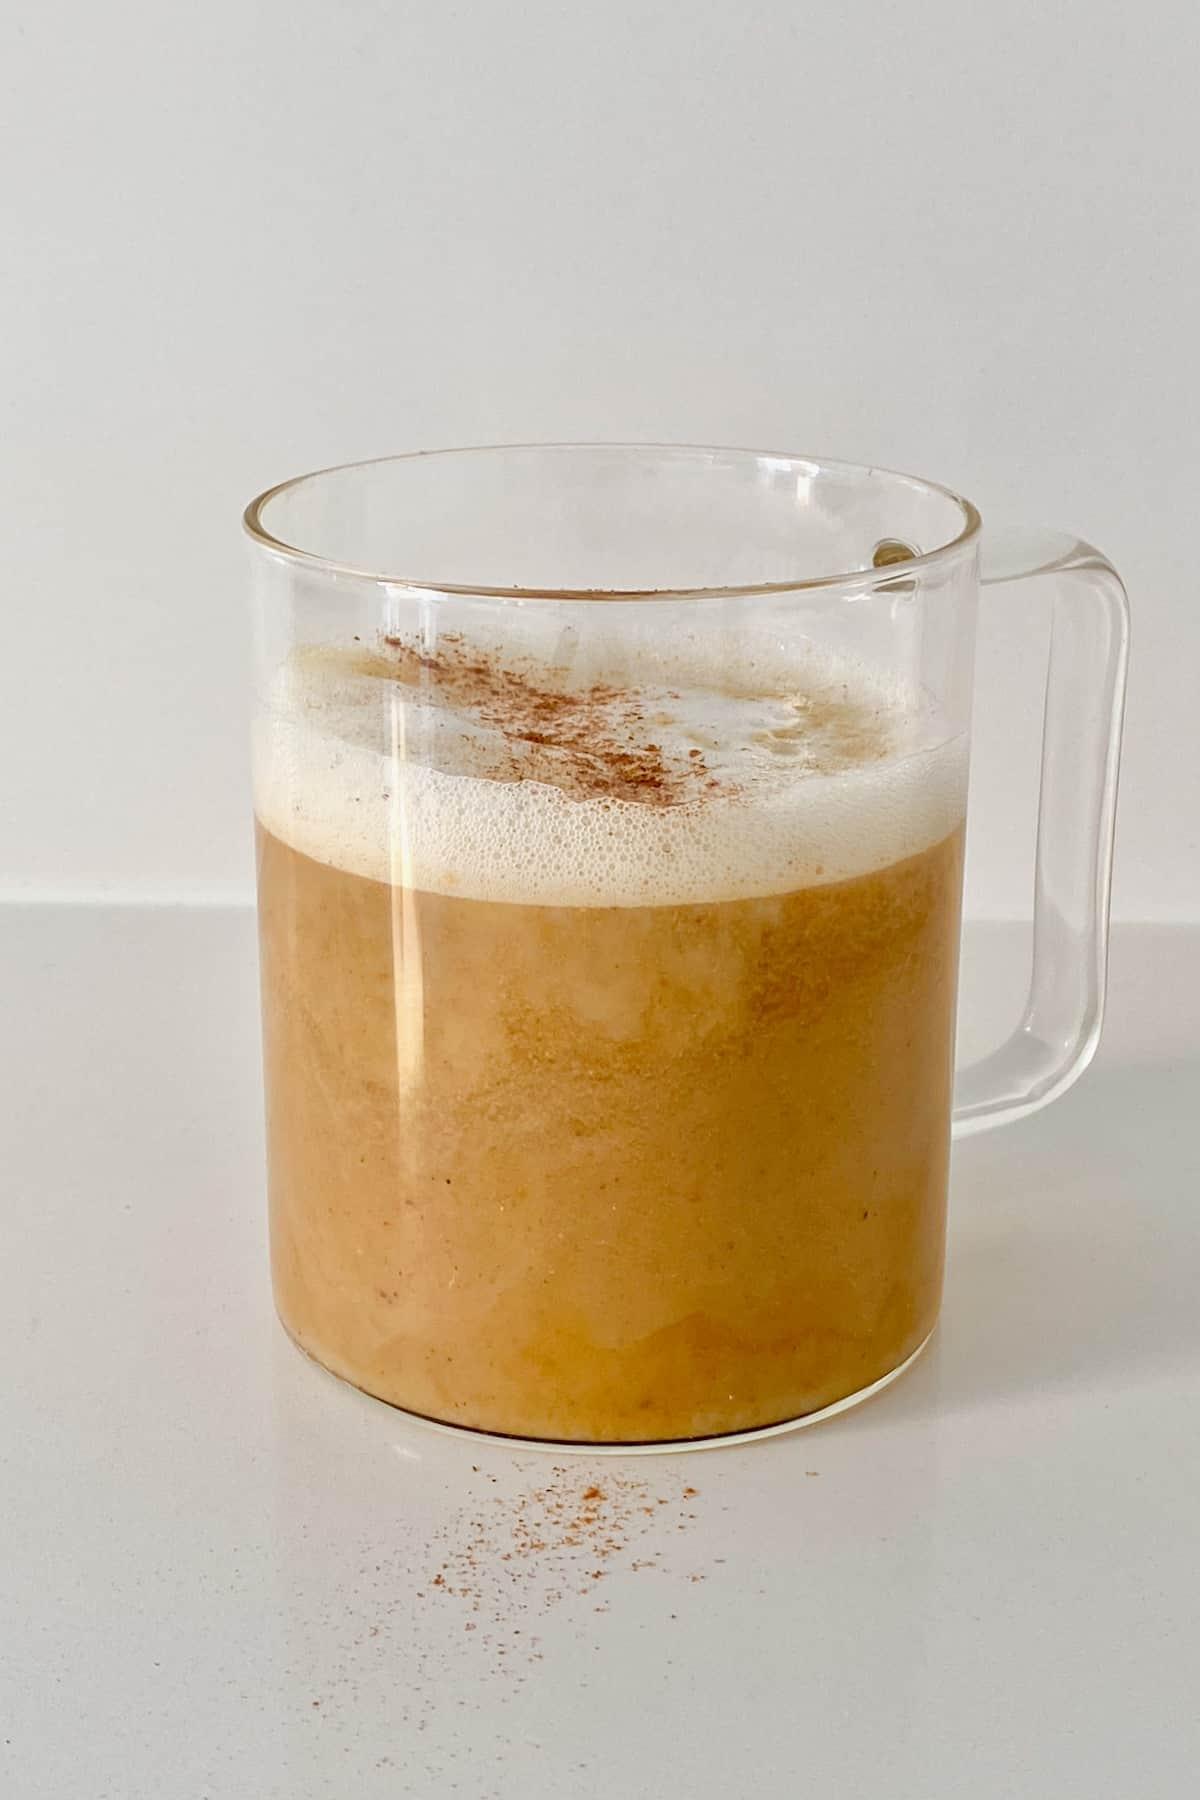 A glass of hot pumpkin spice latte